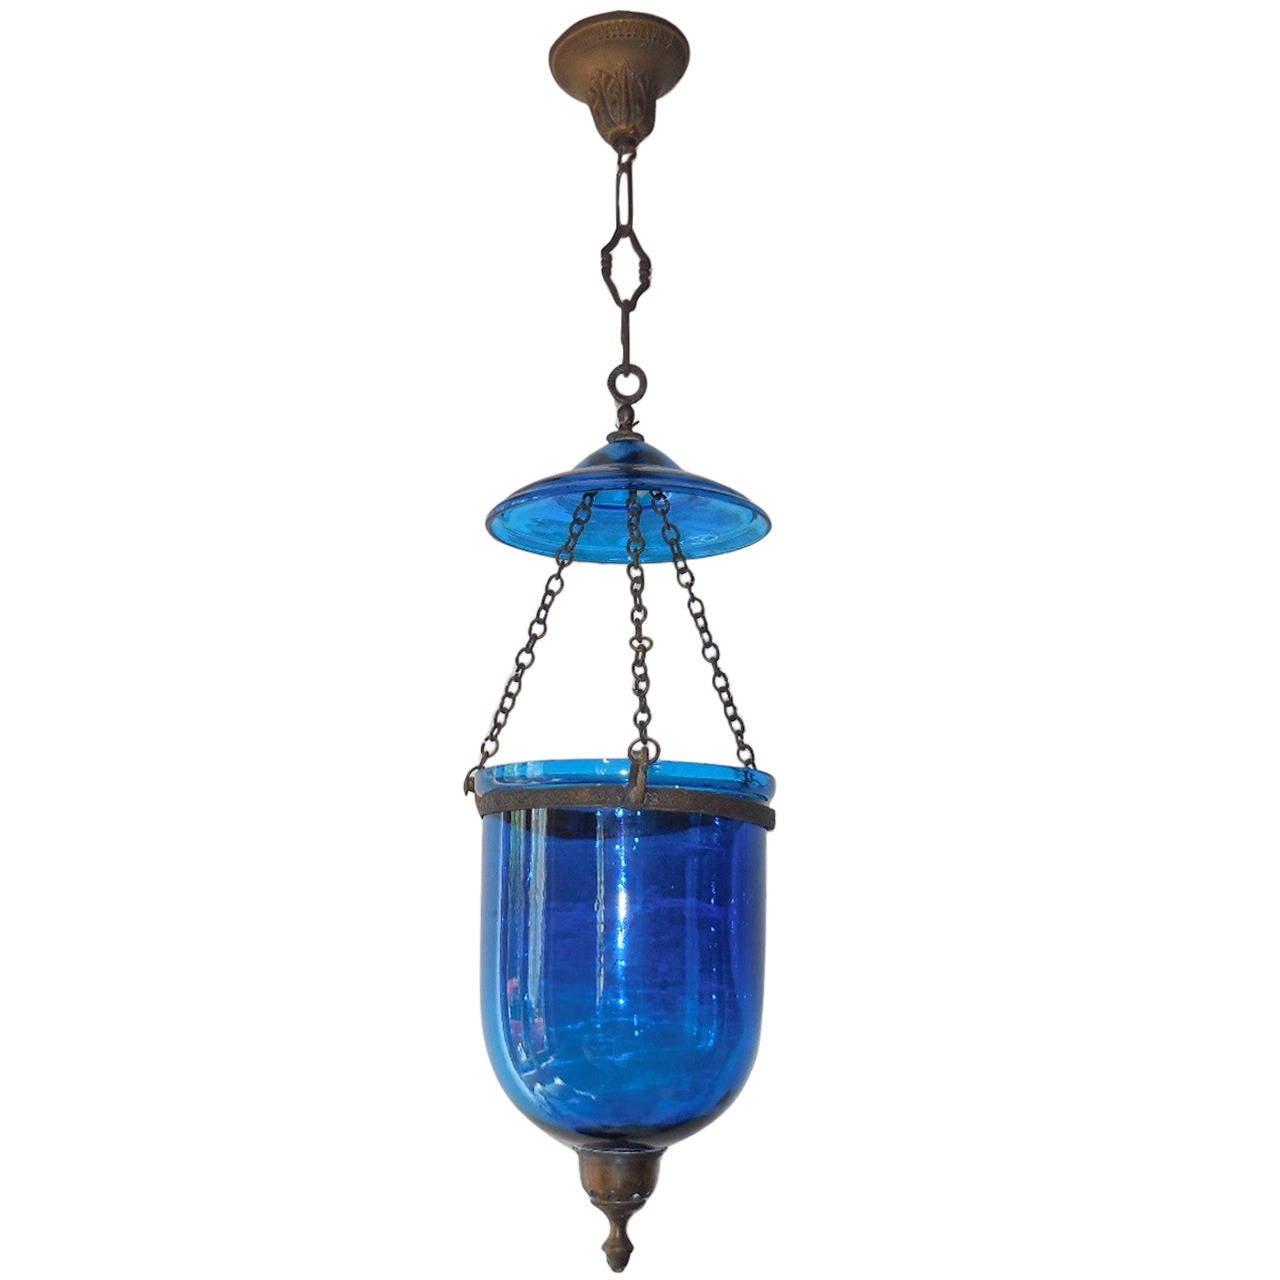 Cobalt blue chandelier musethecollective 19th century english cobalt blue bell jar lantern chandelier at aloadofball Image collections